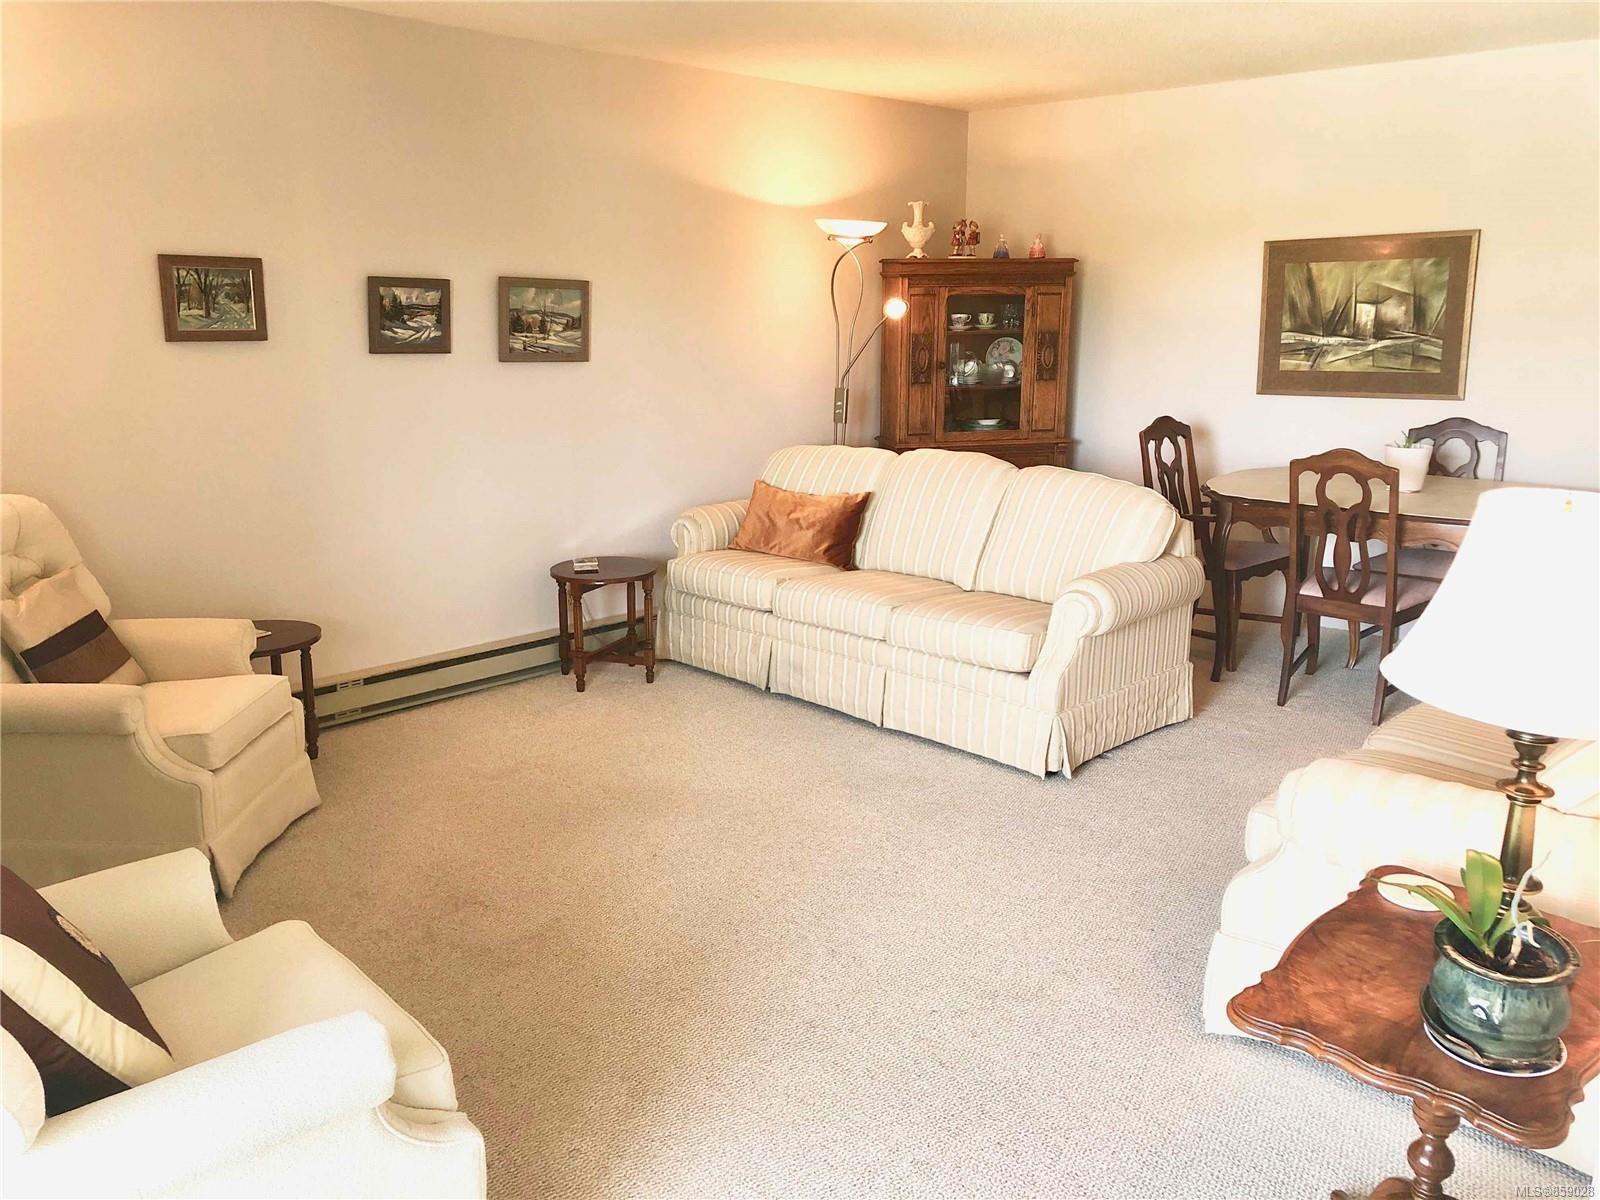 Main Photo: 302 1725 Cedar Hill Cross Rd in : SE Mt Tolmie Condo for sale (Saanich East)  : MLS®# 859028